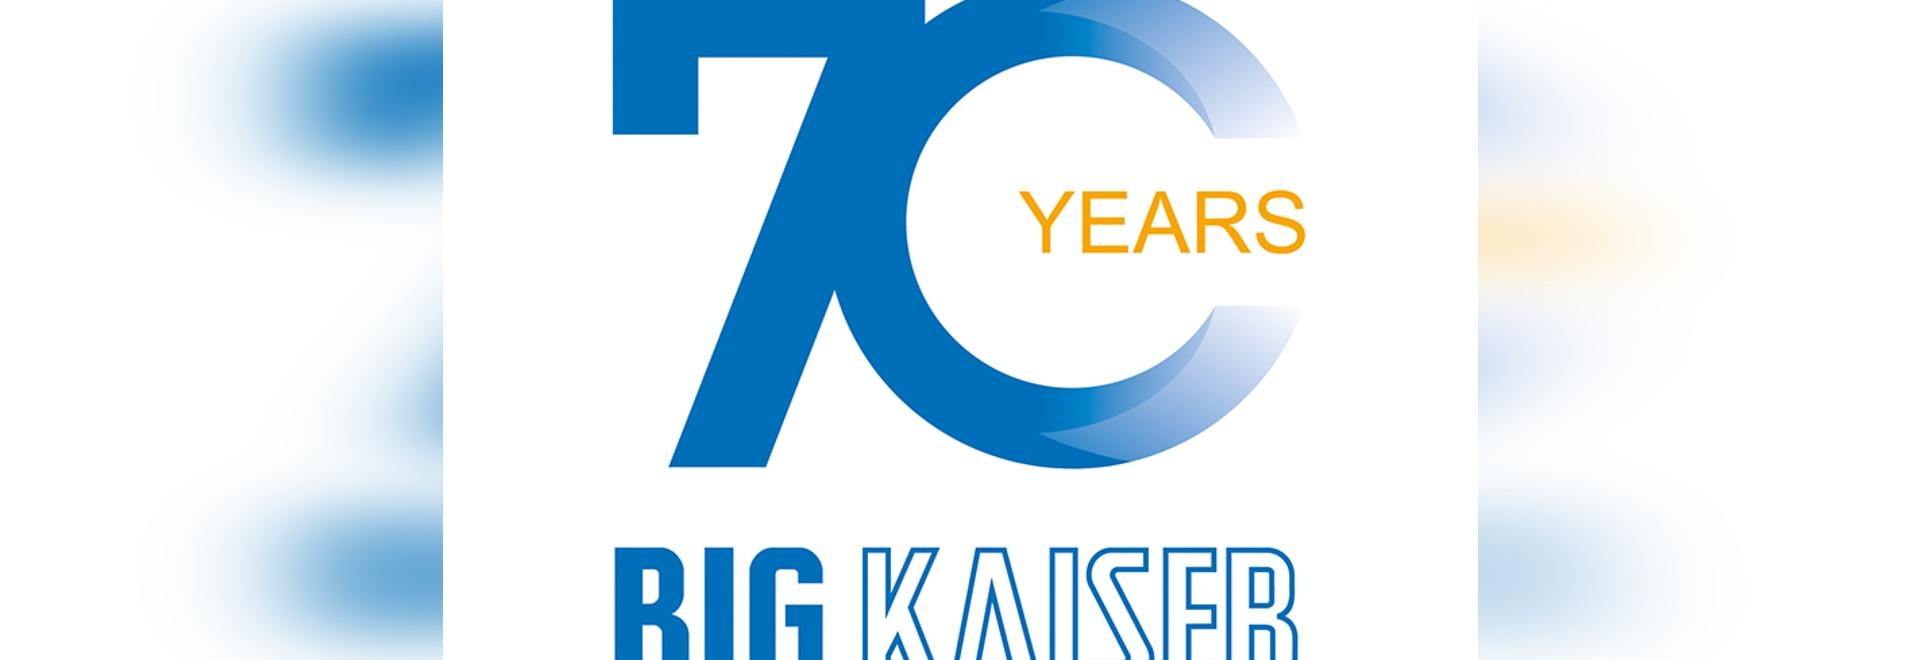 70 Year BIG KAISER